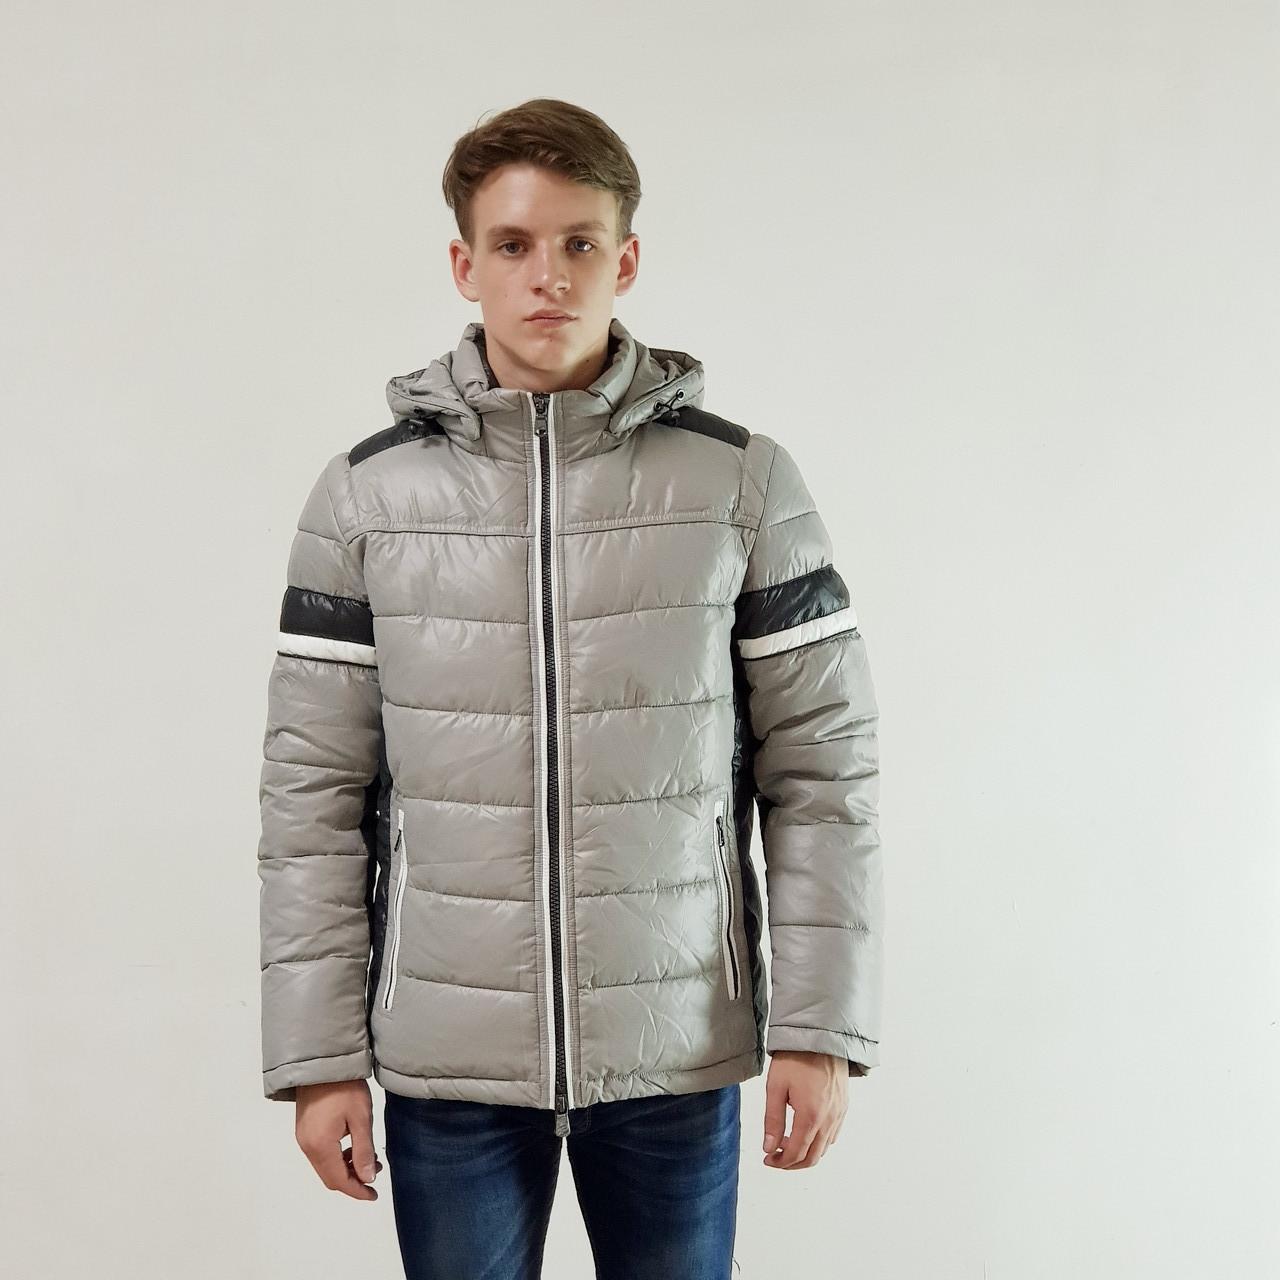 Куртка мужская зимняя Snowimage с капюшоном 46 светло-серый 132-9354